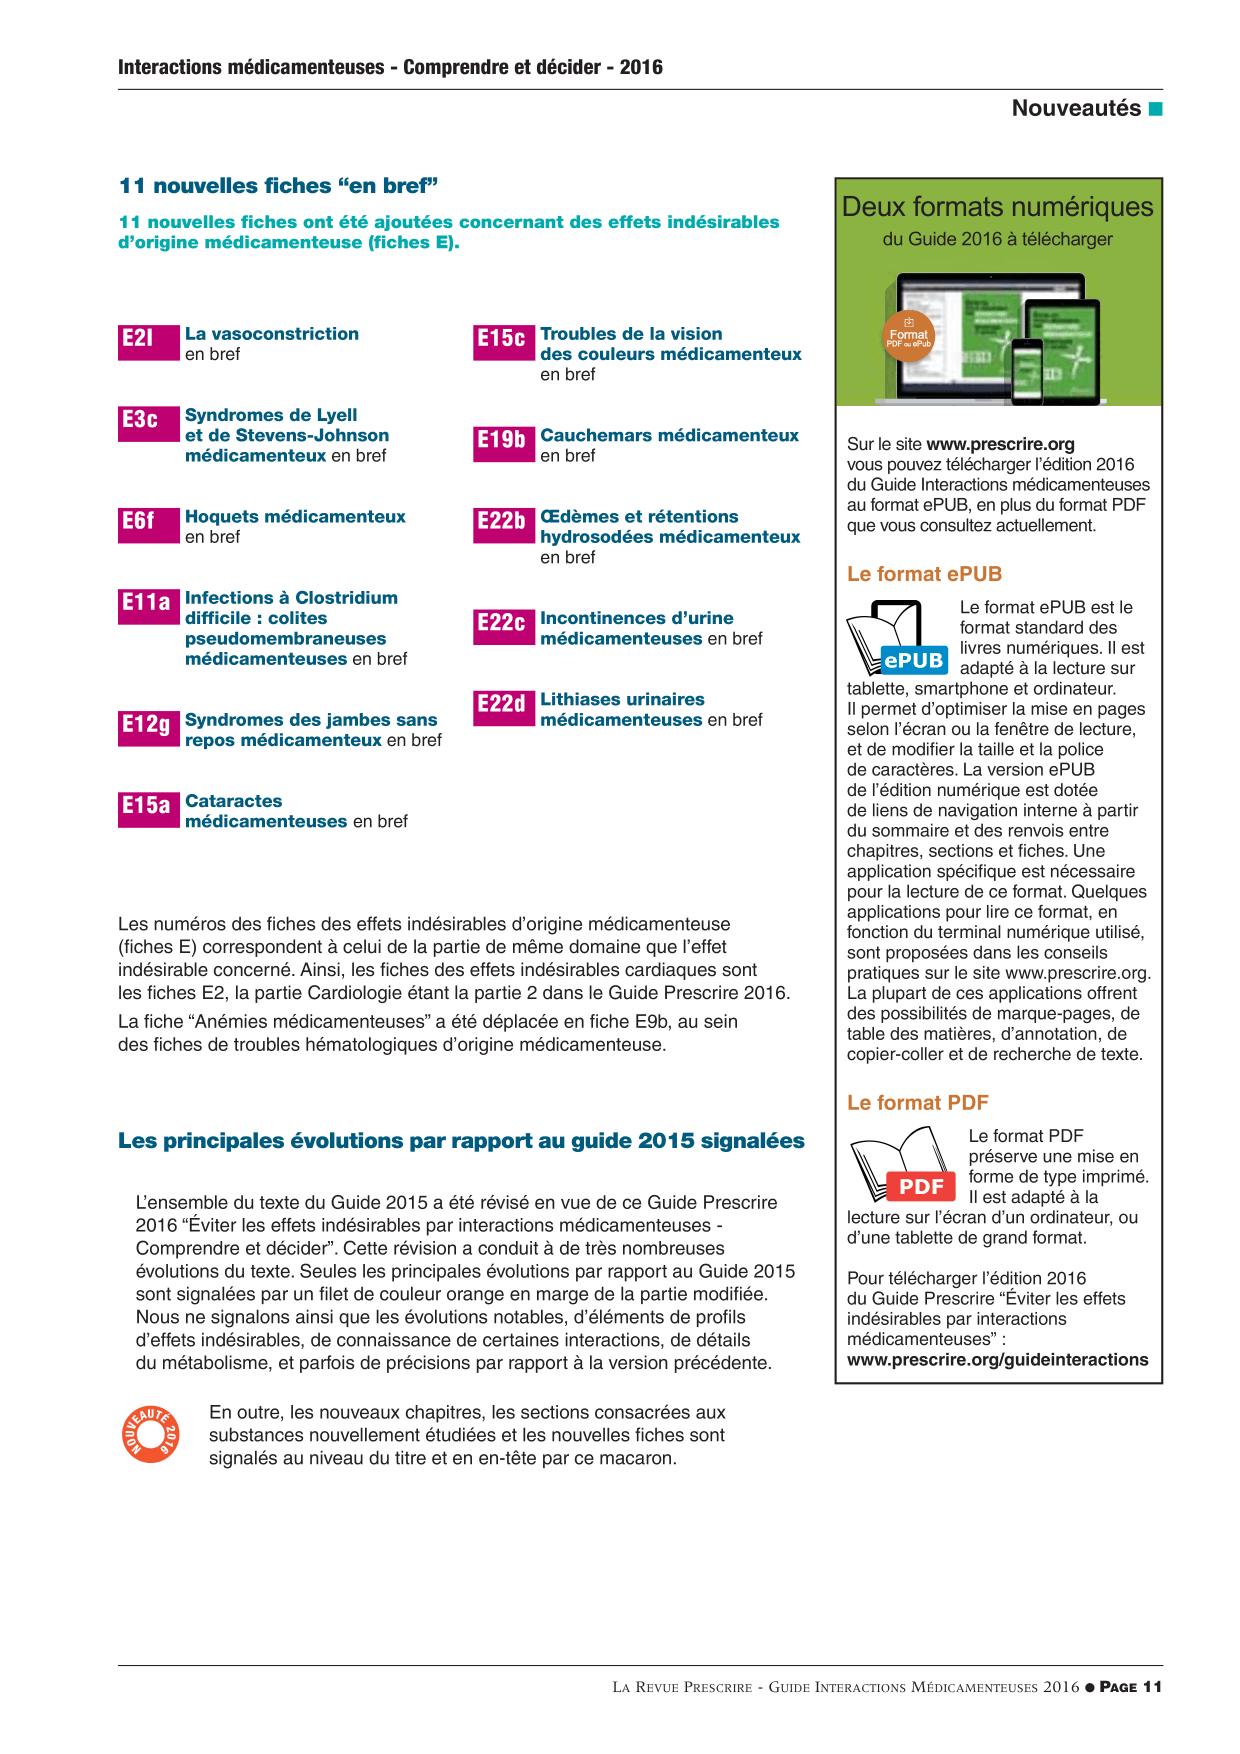 Ivermectin tablet usp 12 mg uses in hindi